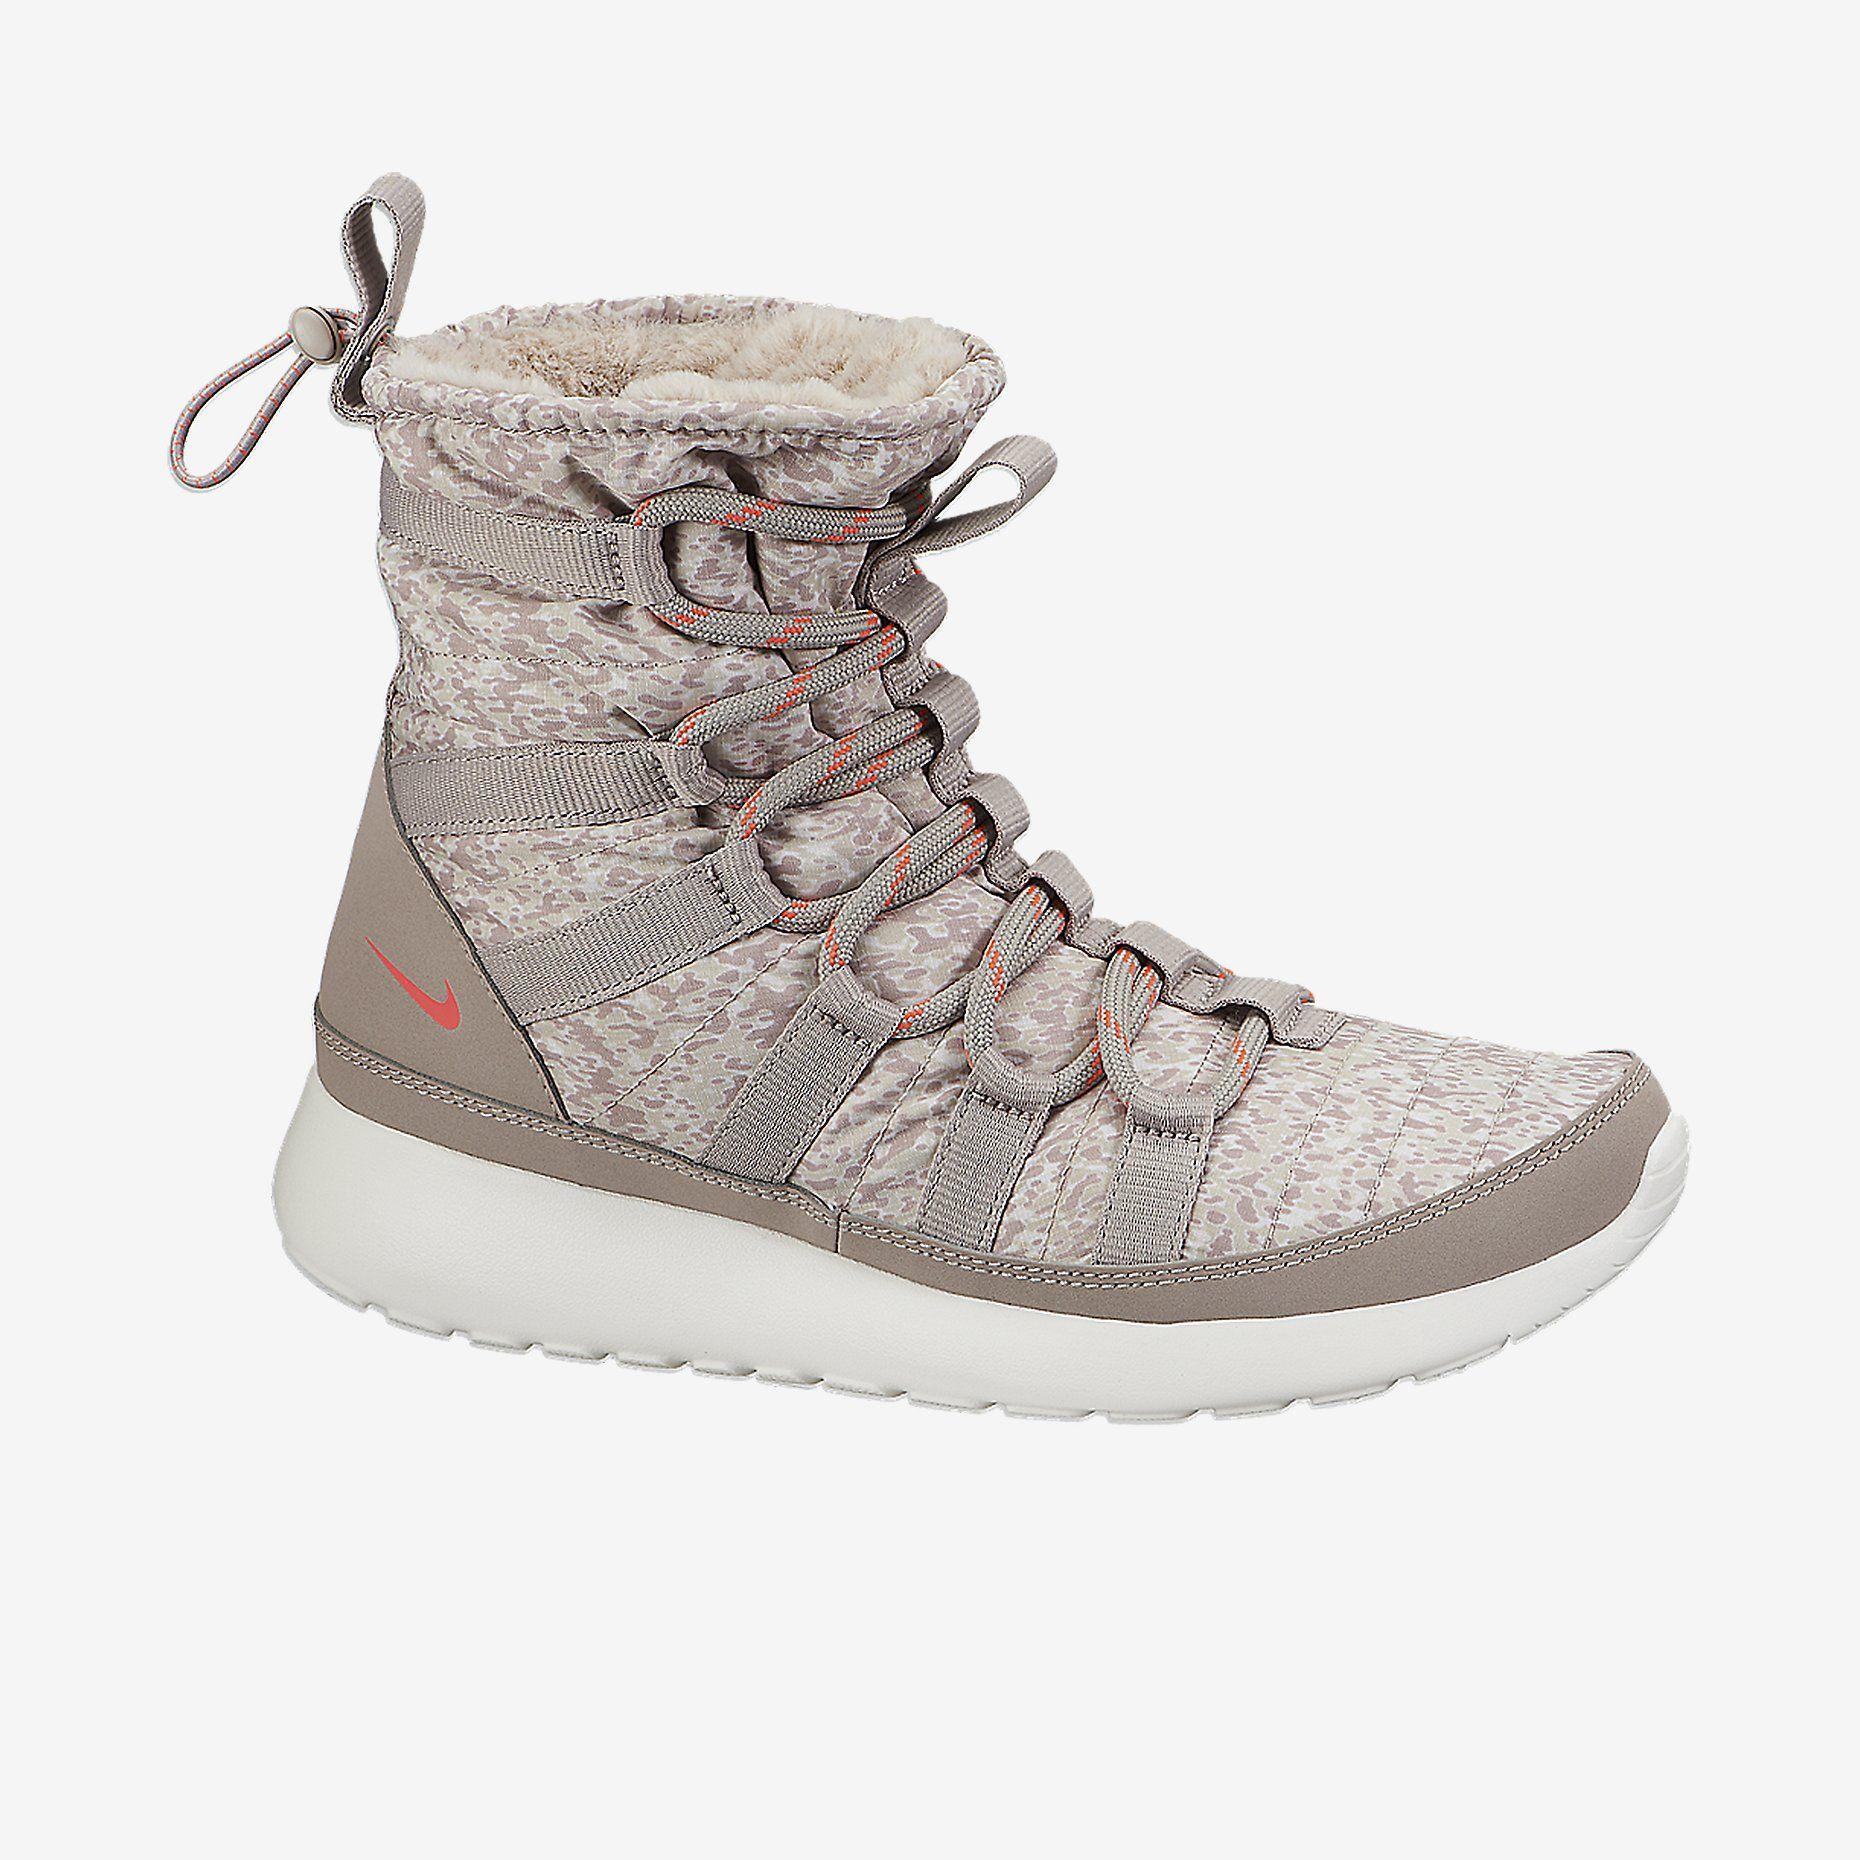 newest 54e6b 69a1b Nike Roshe Run Hi SneakerBoot Women s SneakerBoot. Nike Store